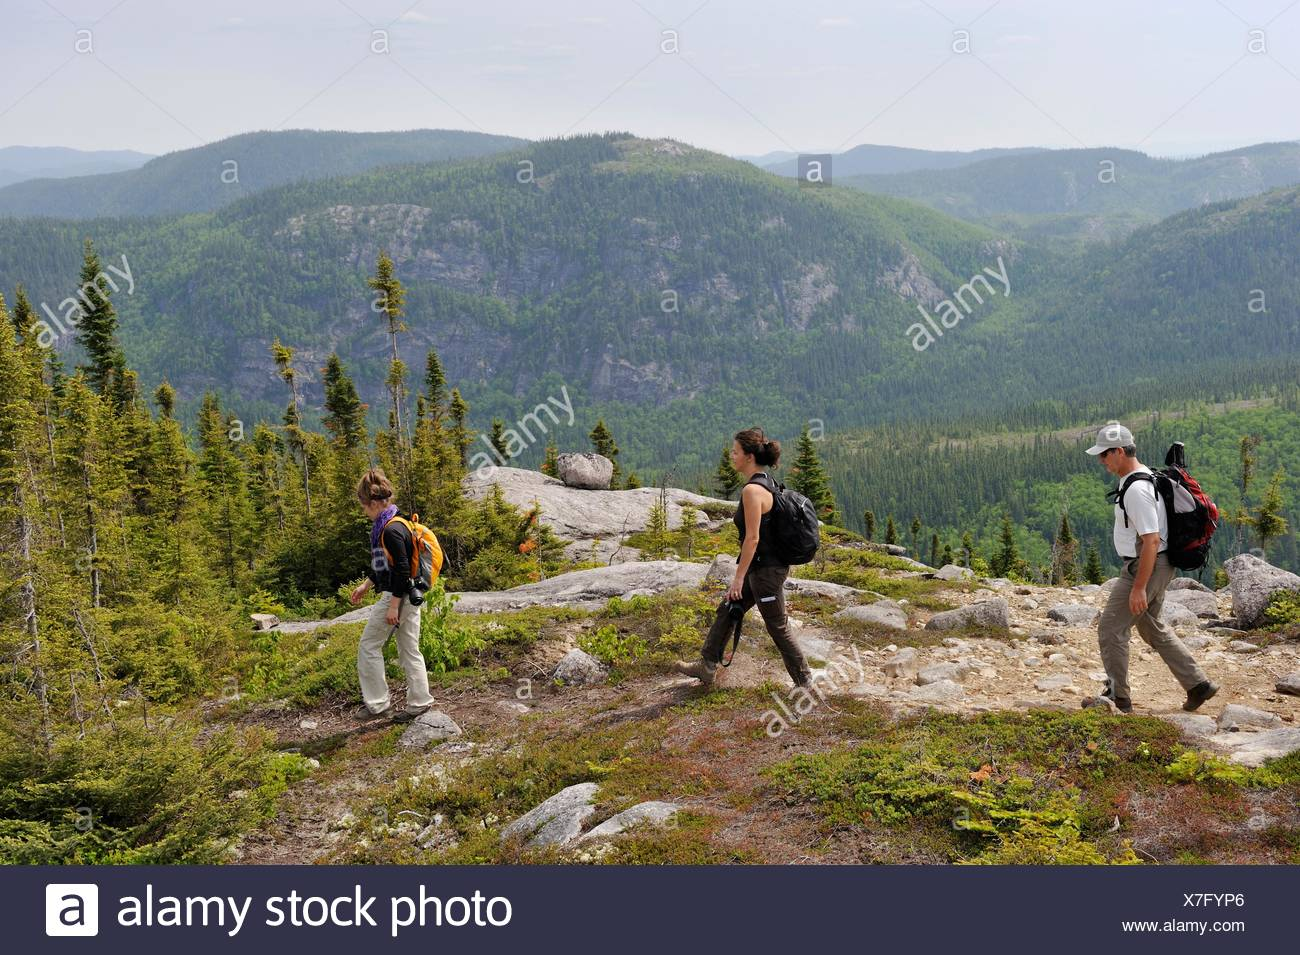 trekker on Pioui path, Grands-Jardins National Park, Province of Quebec, Canada, North America - Stock Image